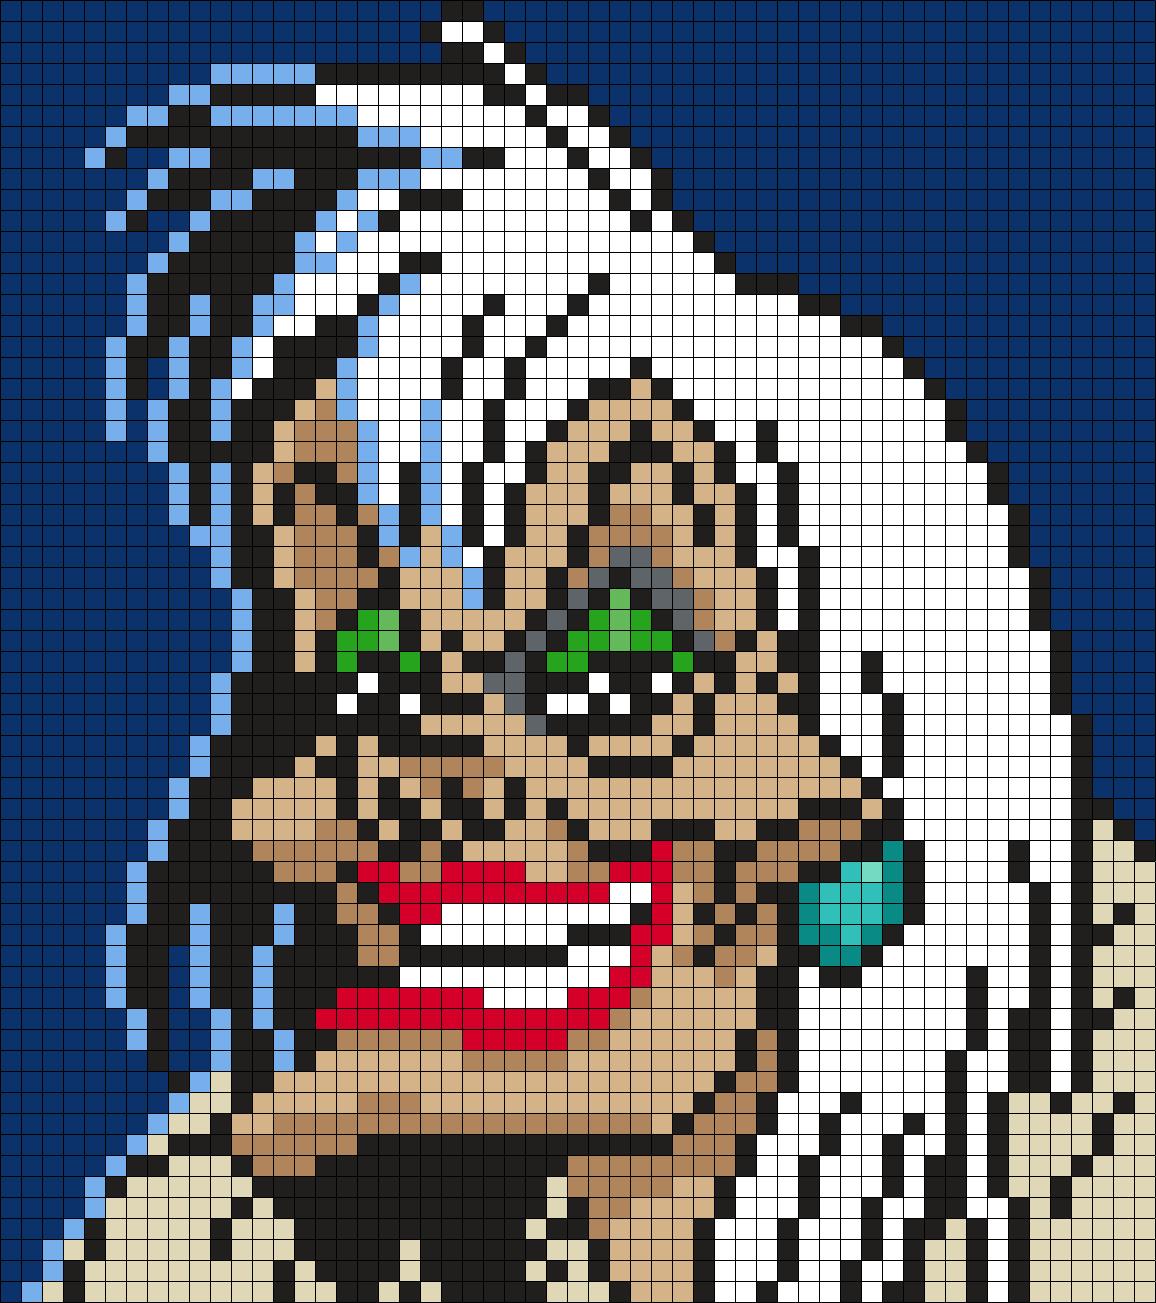 Cruella de Vil from 18 Dalmations (18 X 18 Square Grid Pattern